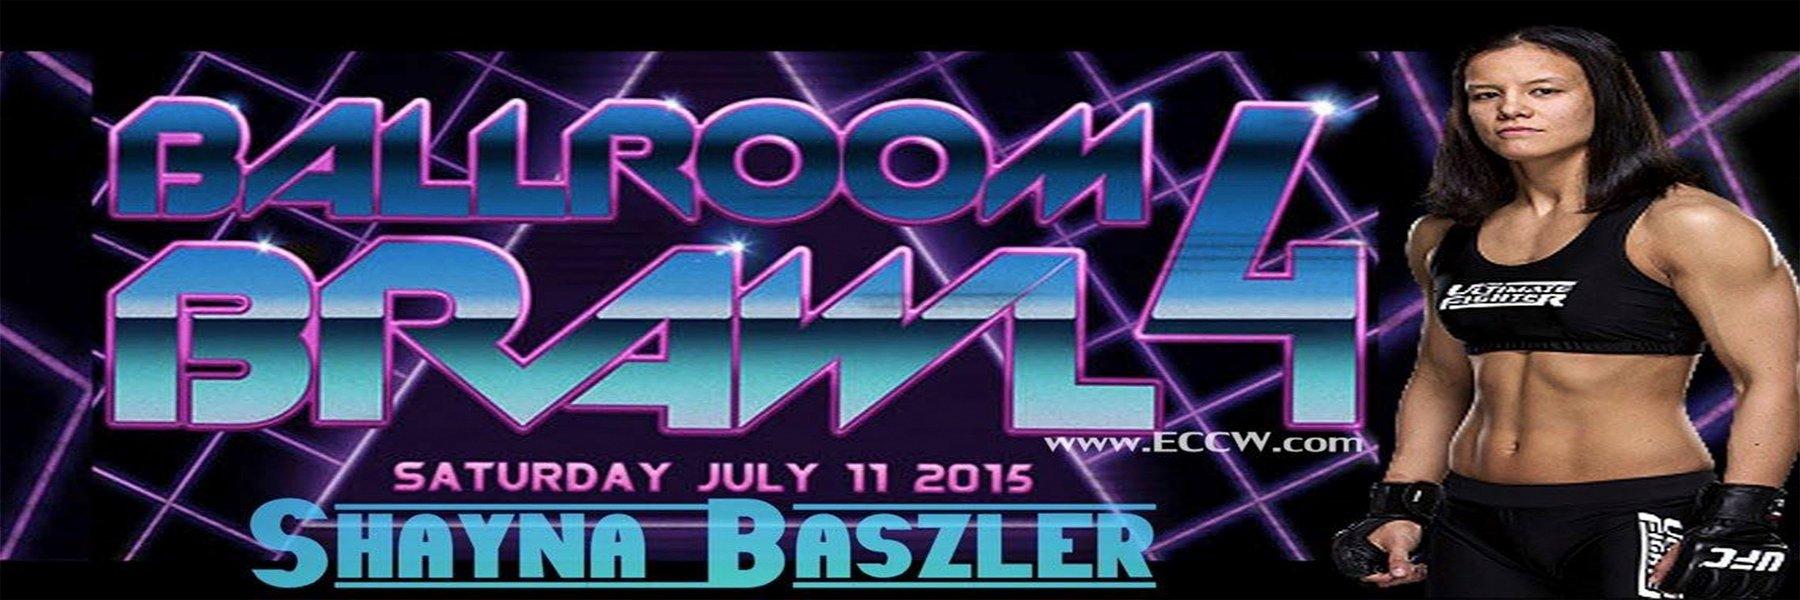 ECCW Ballroom Brawl IV 7/11/15